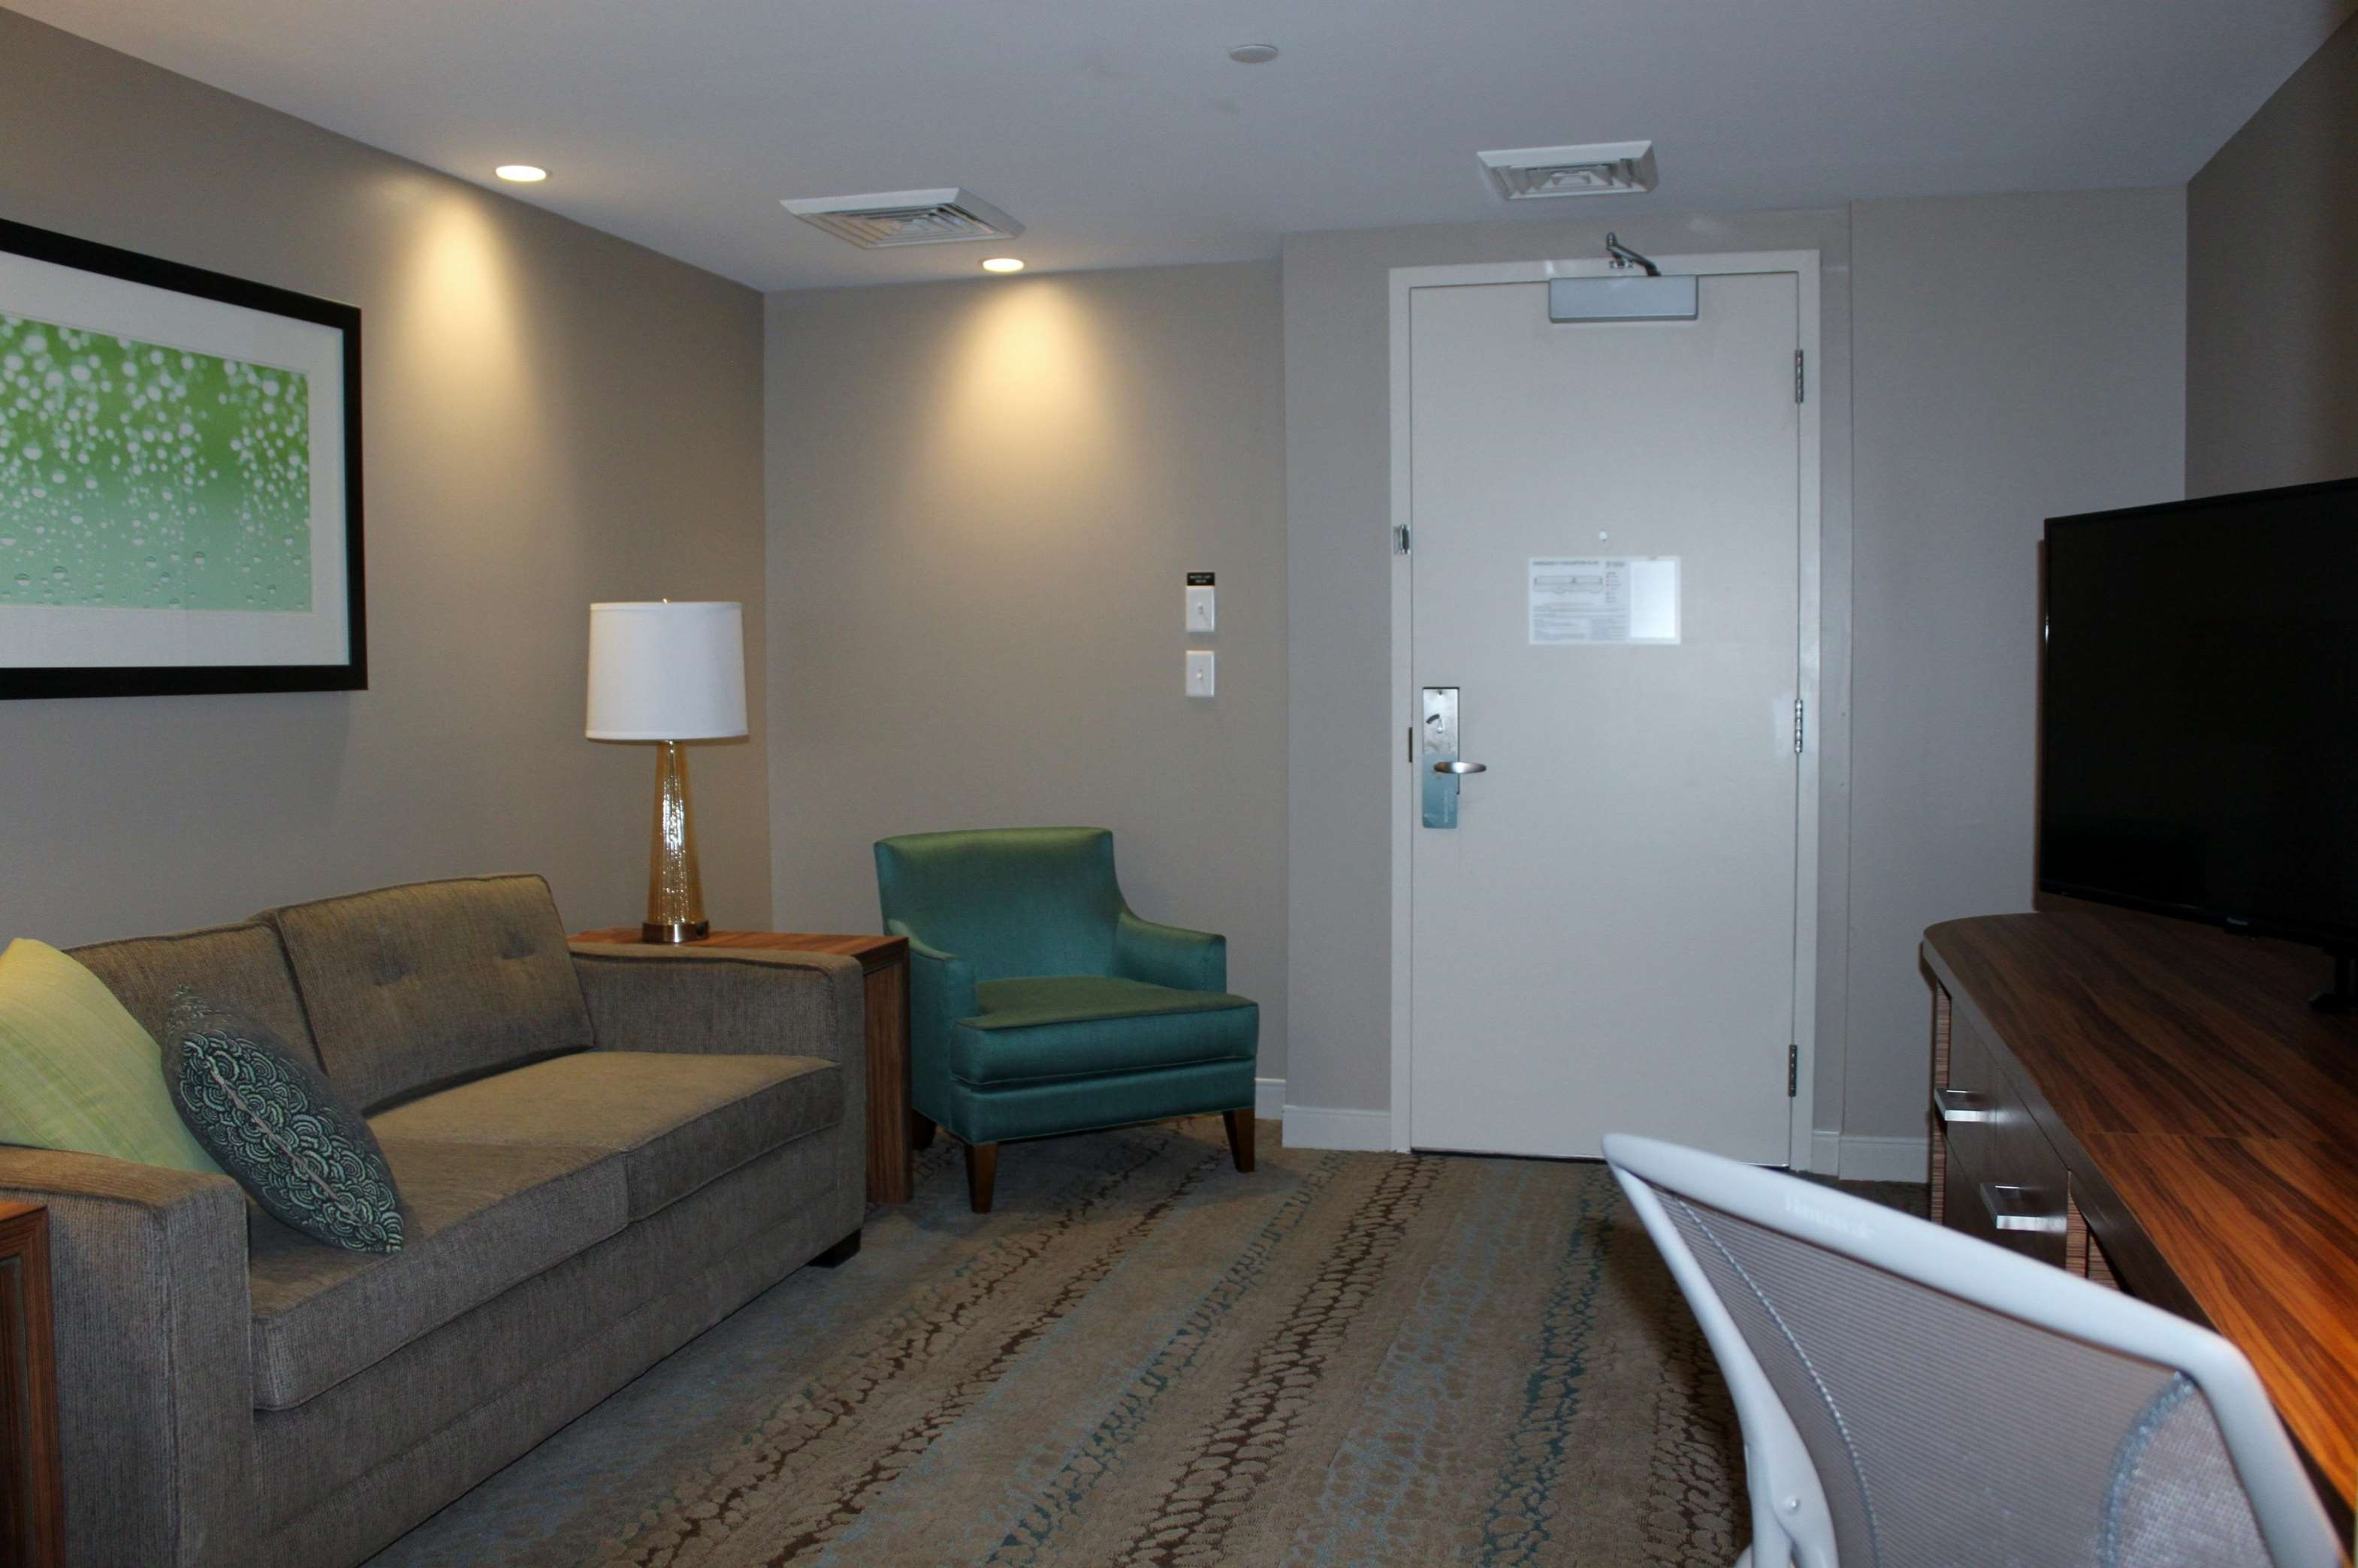 Hilton Garden Inn Boston/Marlborough image 15